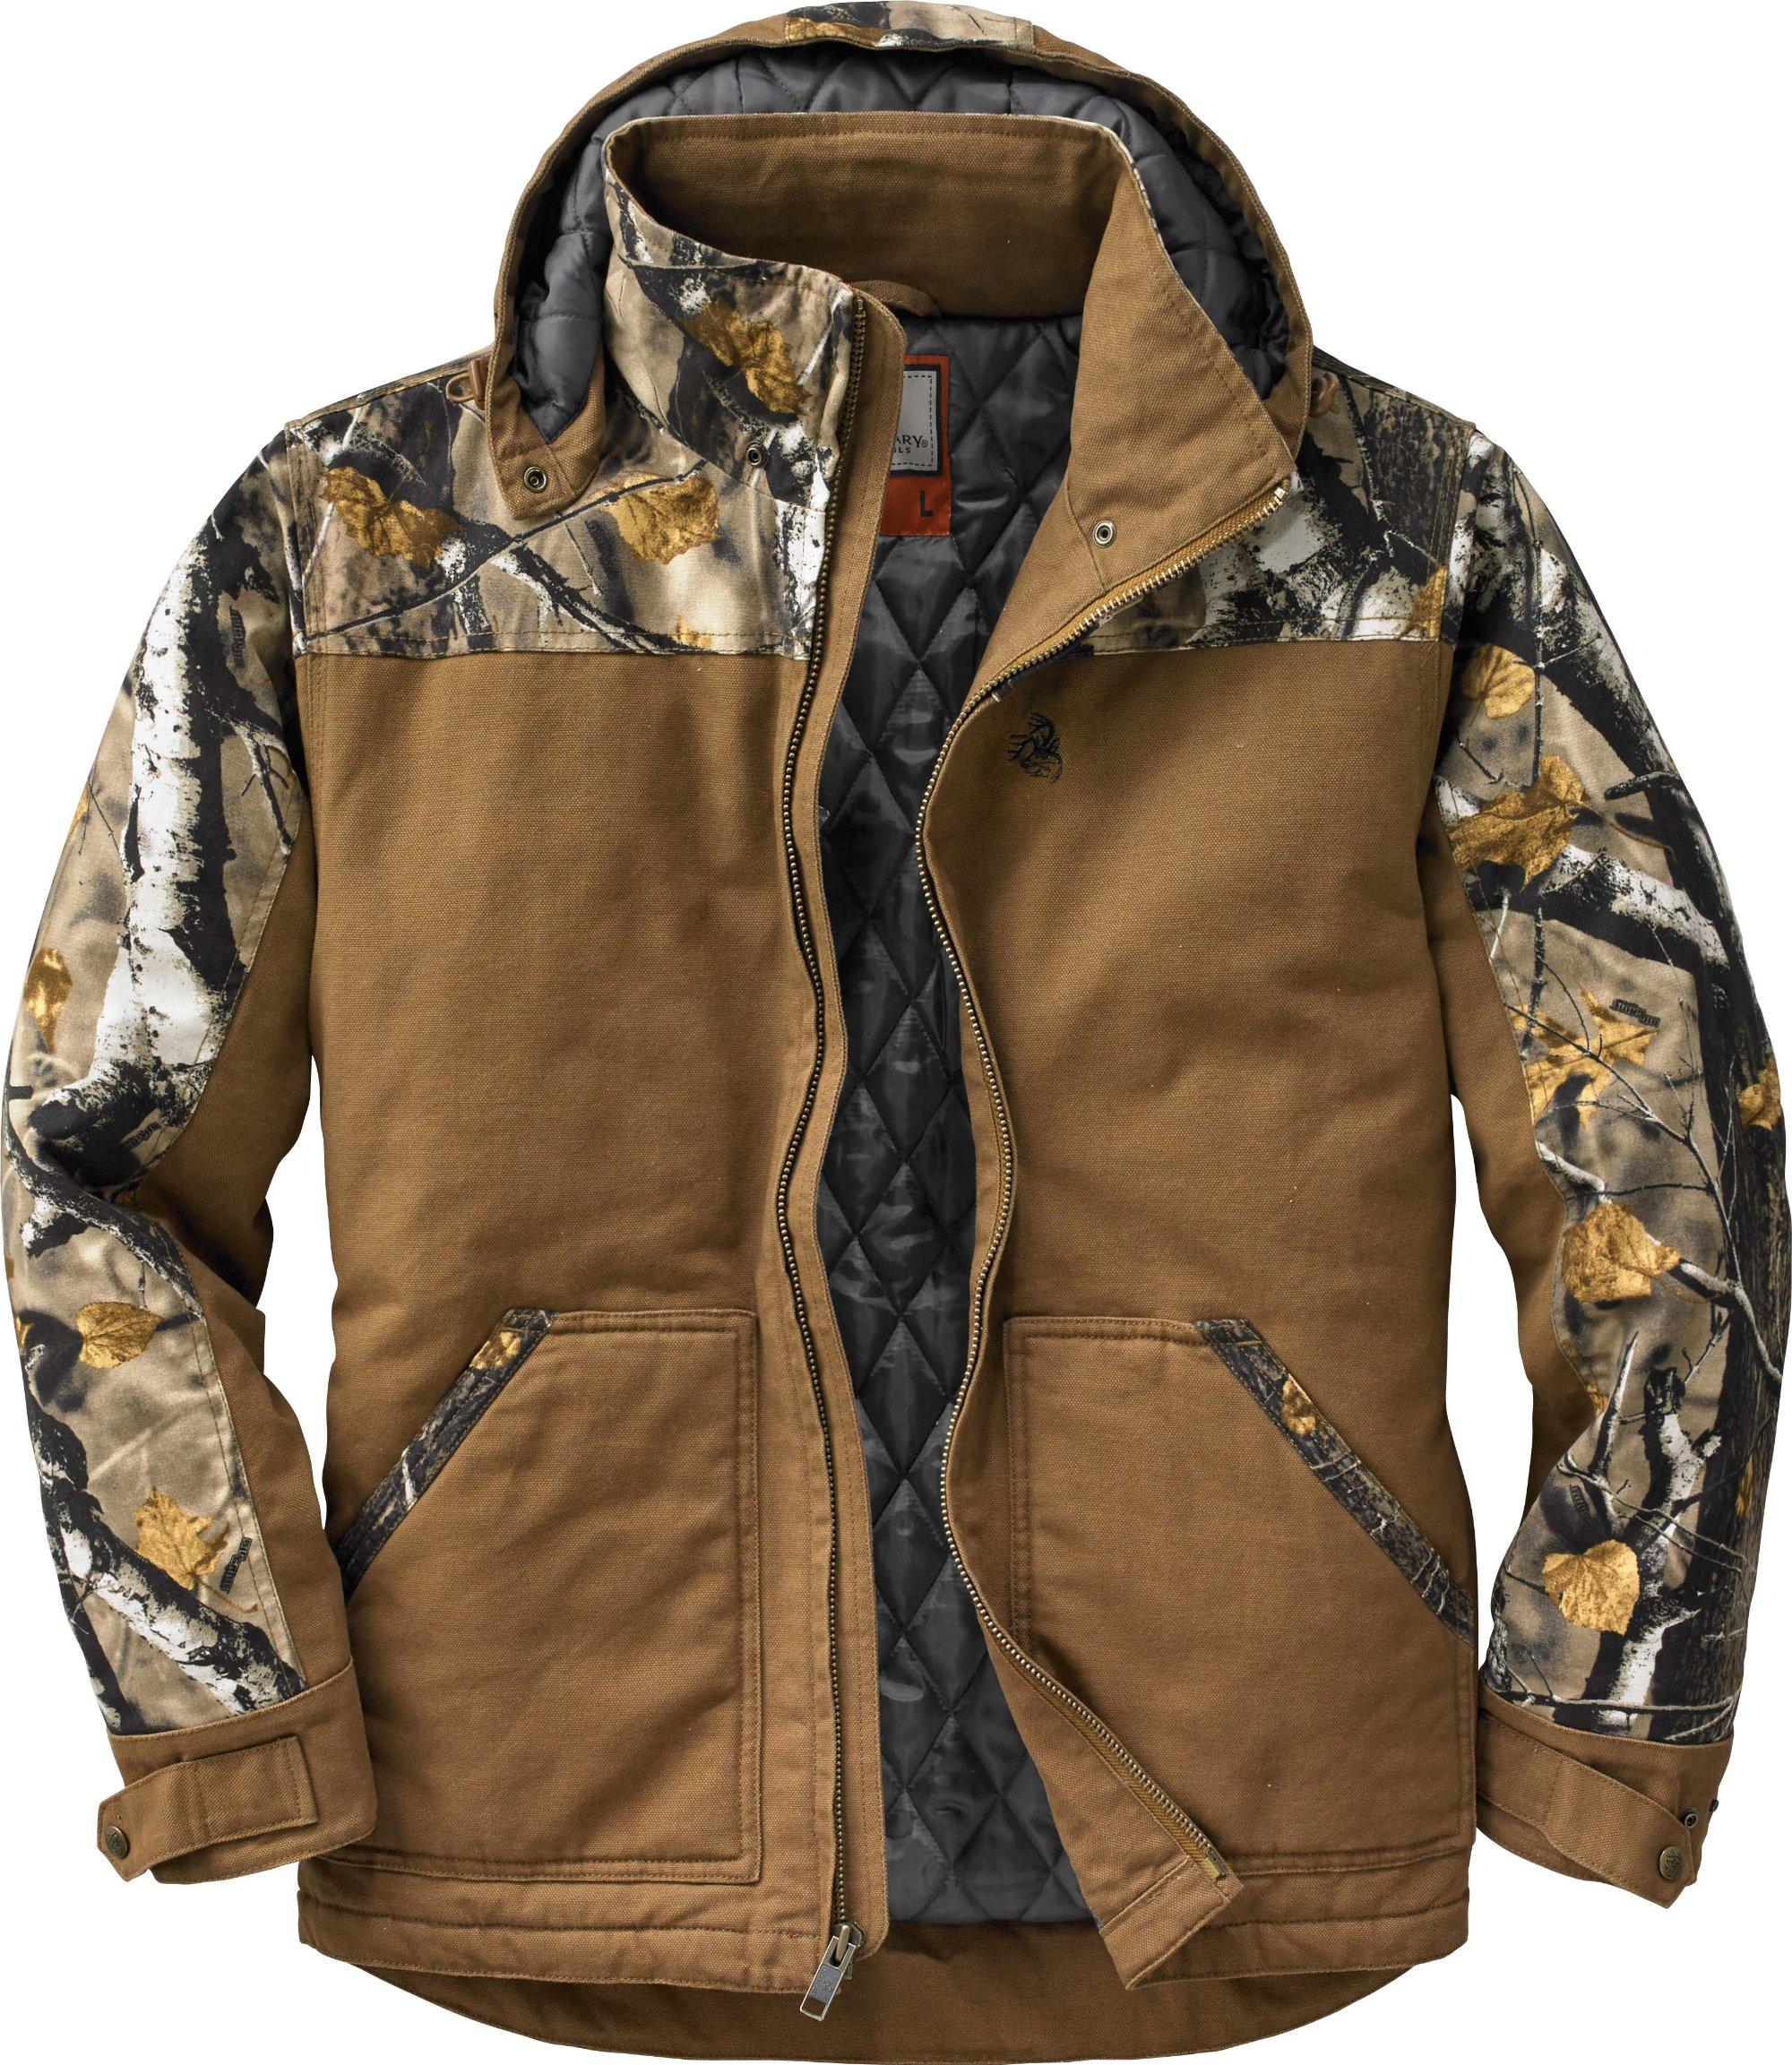 Canvas Cross Trail Workwear Jacket | Legendary Whitetails